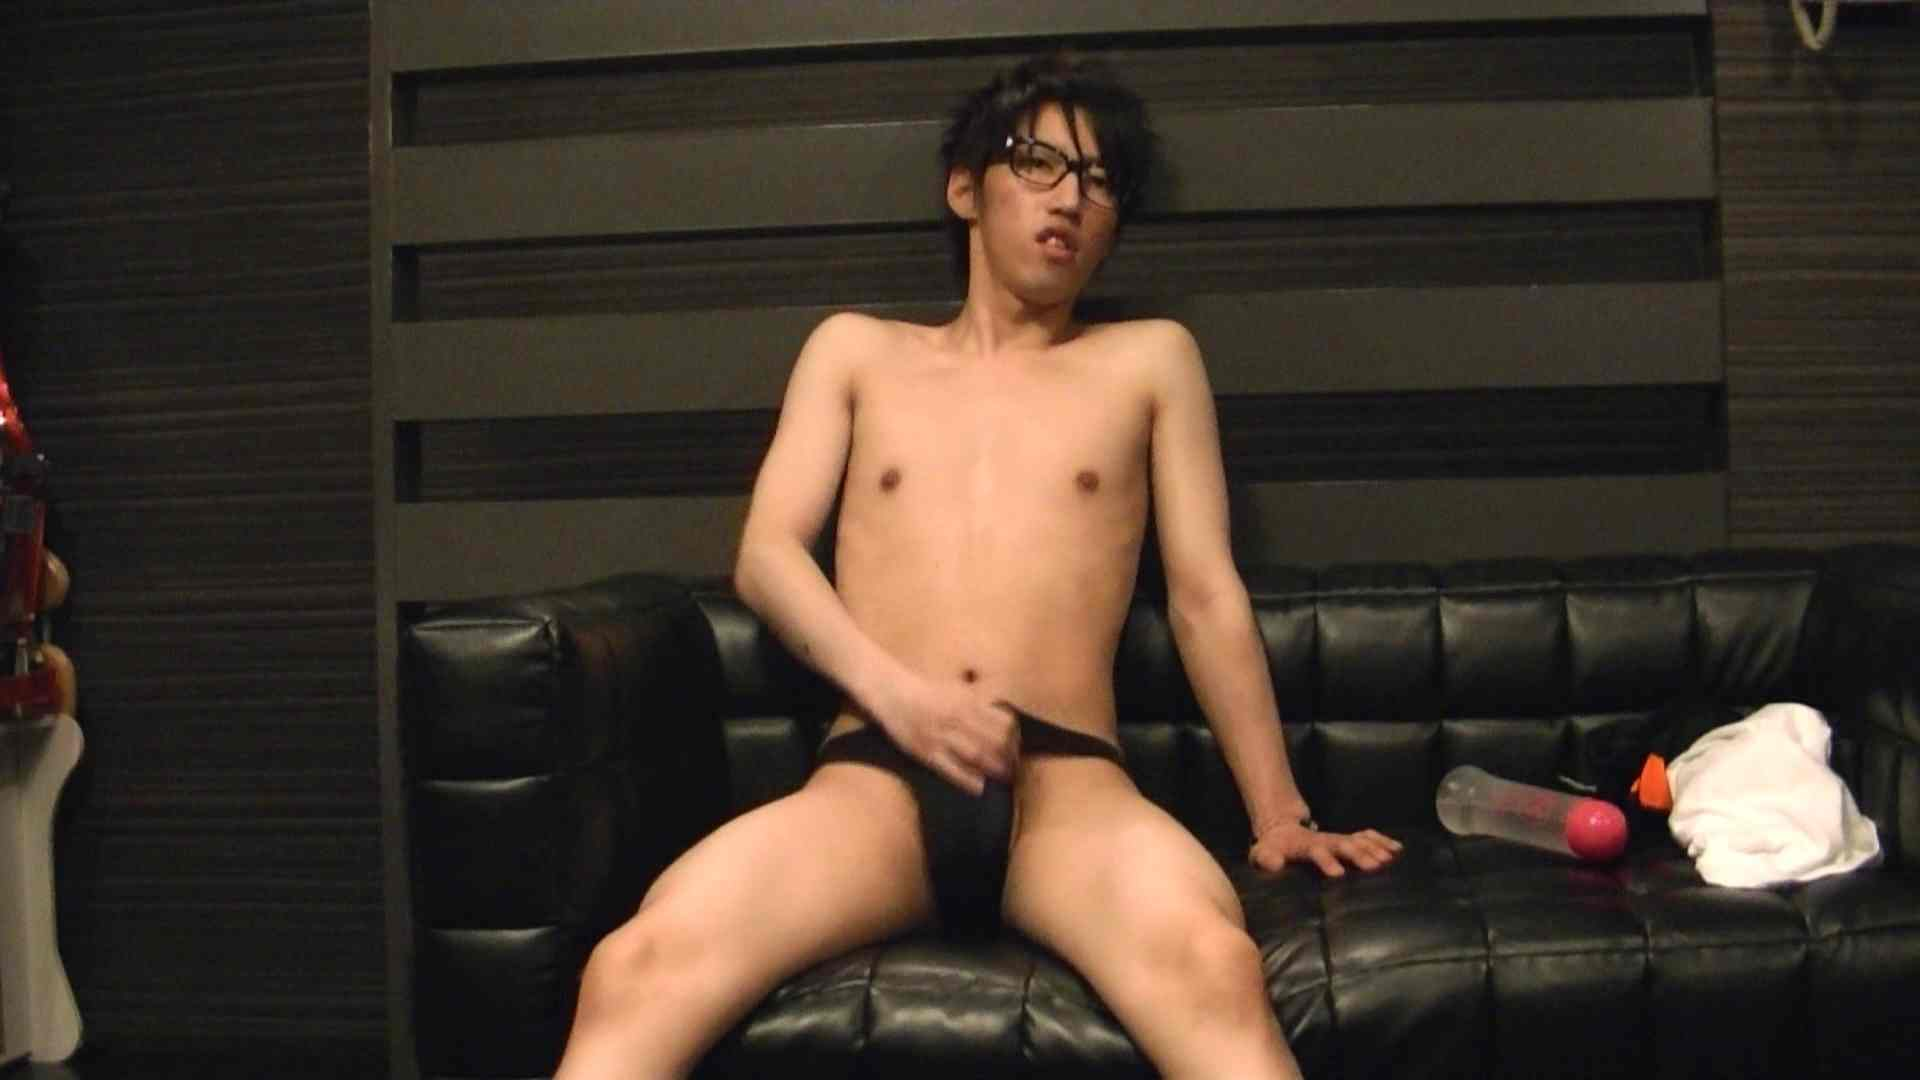 Mr.オナックスさん投稿!HD 貴方のオナニー三万円で撮影させてください。VOL.04 ノンケのオナニー ゲイアダルト画像 55連発 31